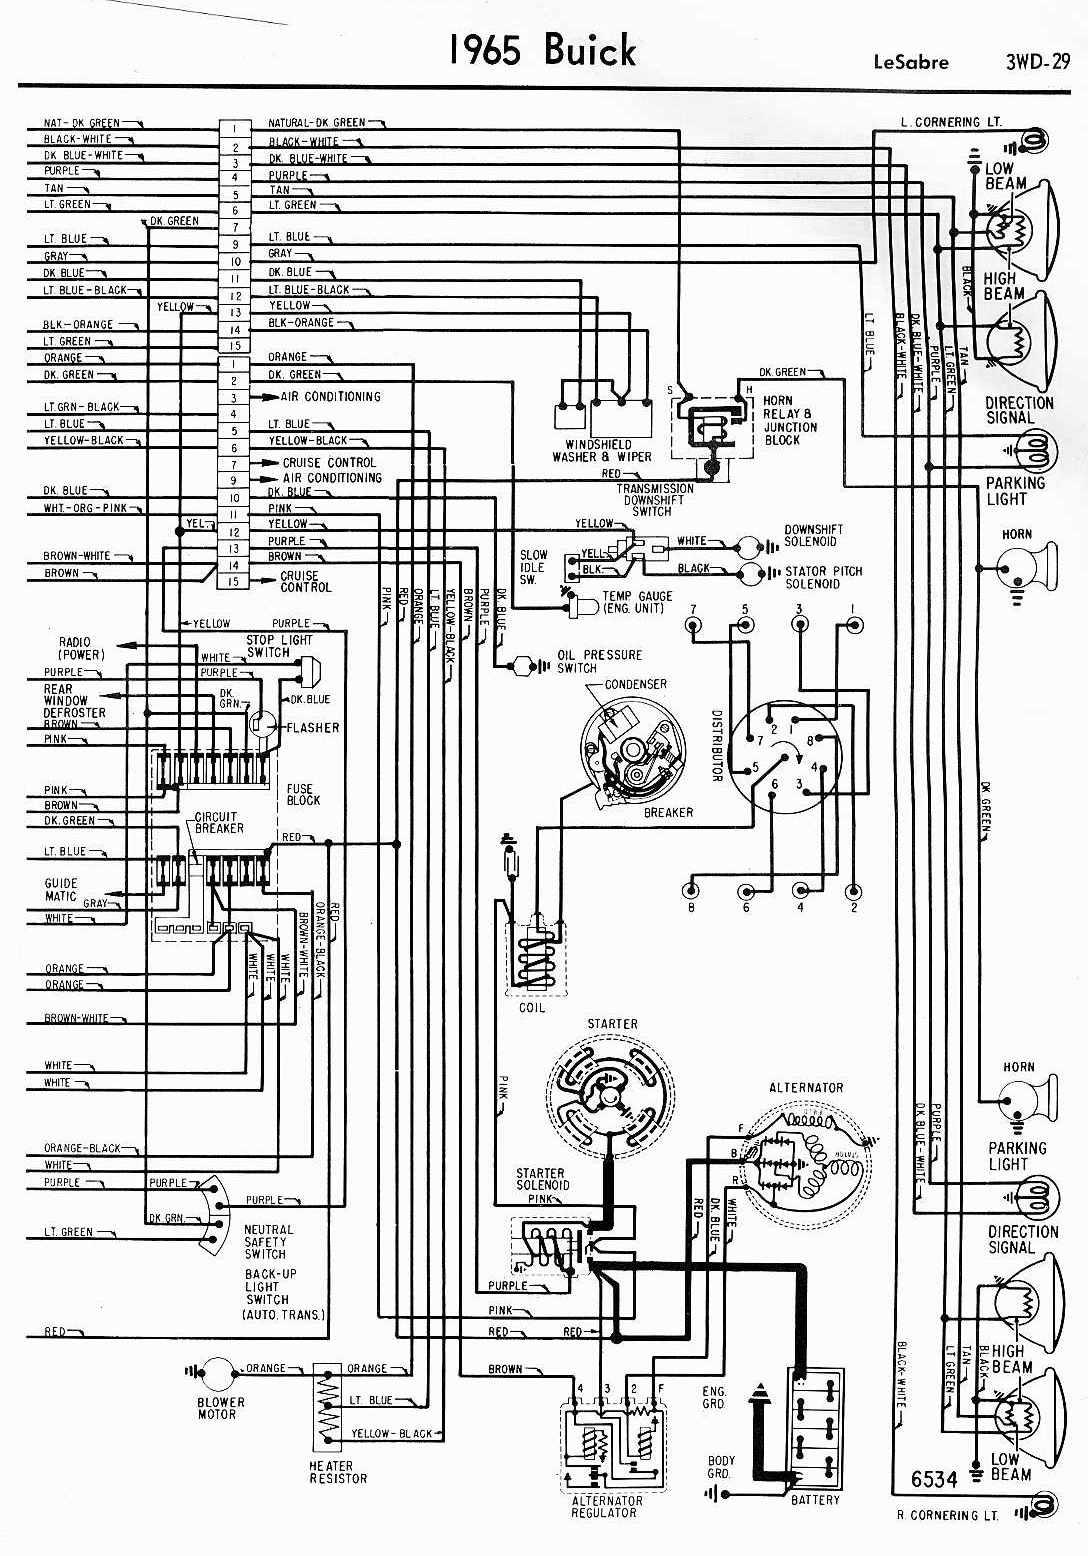 medium resolution of 1990 buick lesabre wiring diagram trusted wiring diagram rh 12 nl schoenheitsbrieftaube de 2000 buick lesabre heater location 2001 buick lesabre wiring